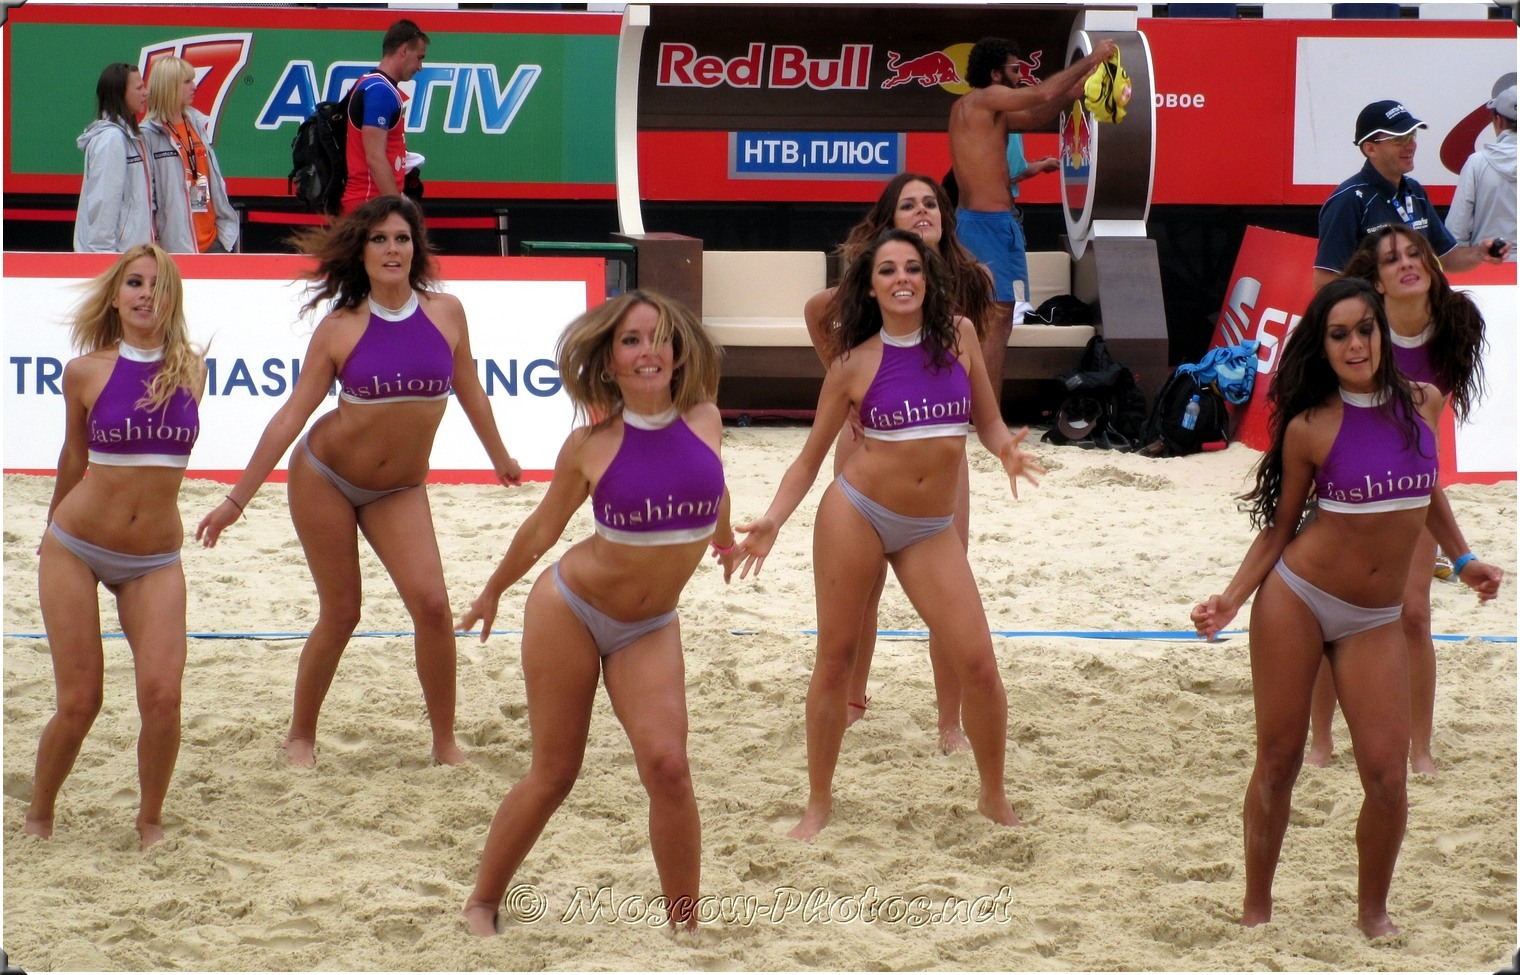 Beach Volleyball Bikini Cheerleaders